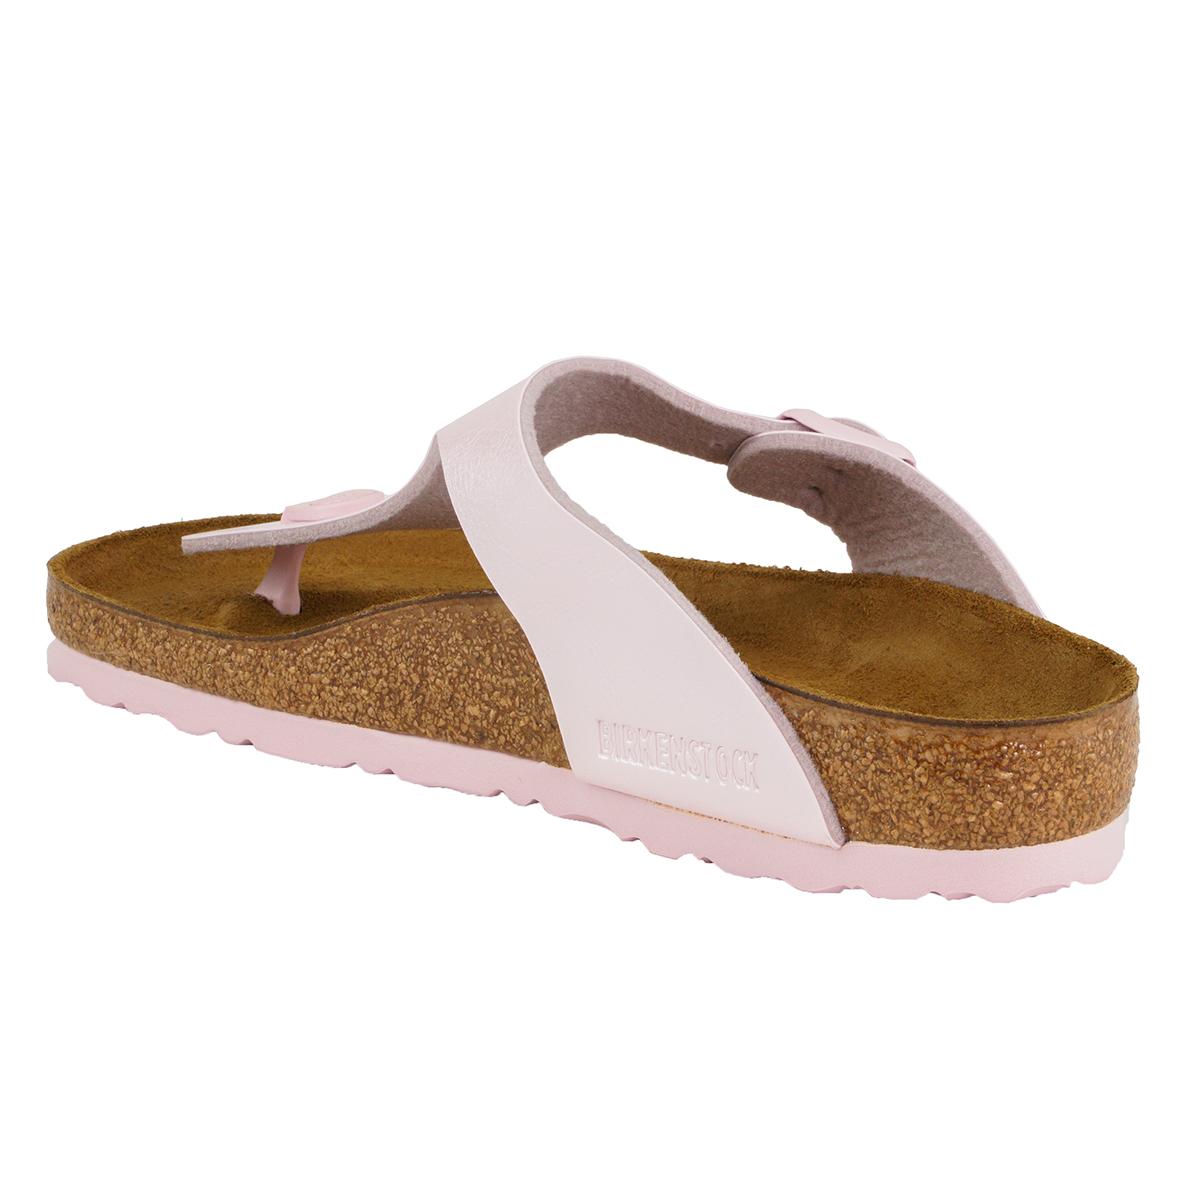 86c229b55b2f62 Birkenstock Gizeh Birko-Flor Sandals Graceful Rosa 38